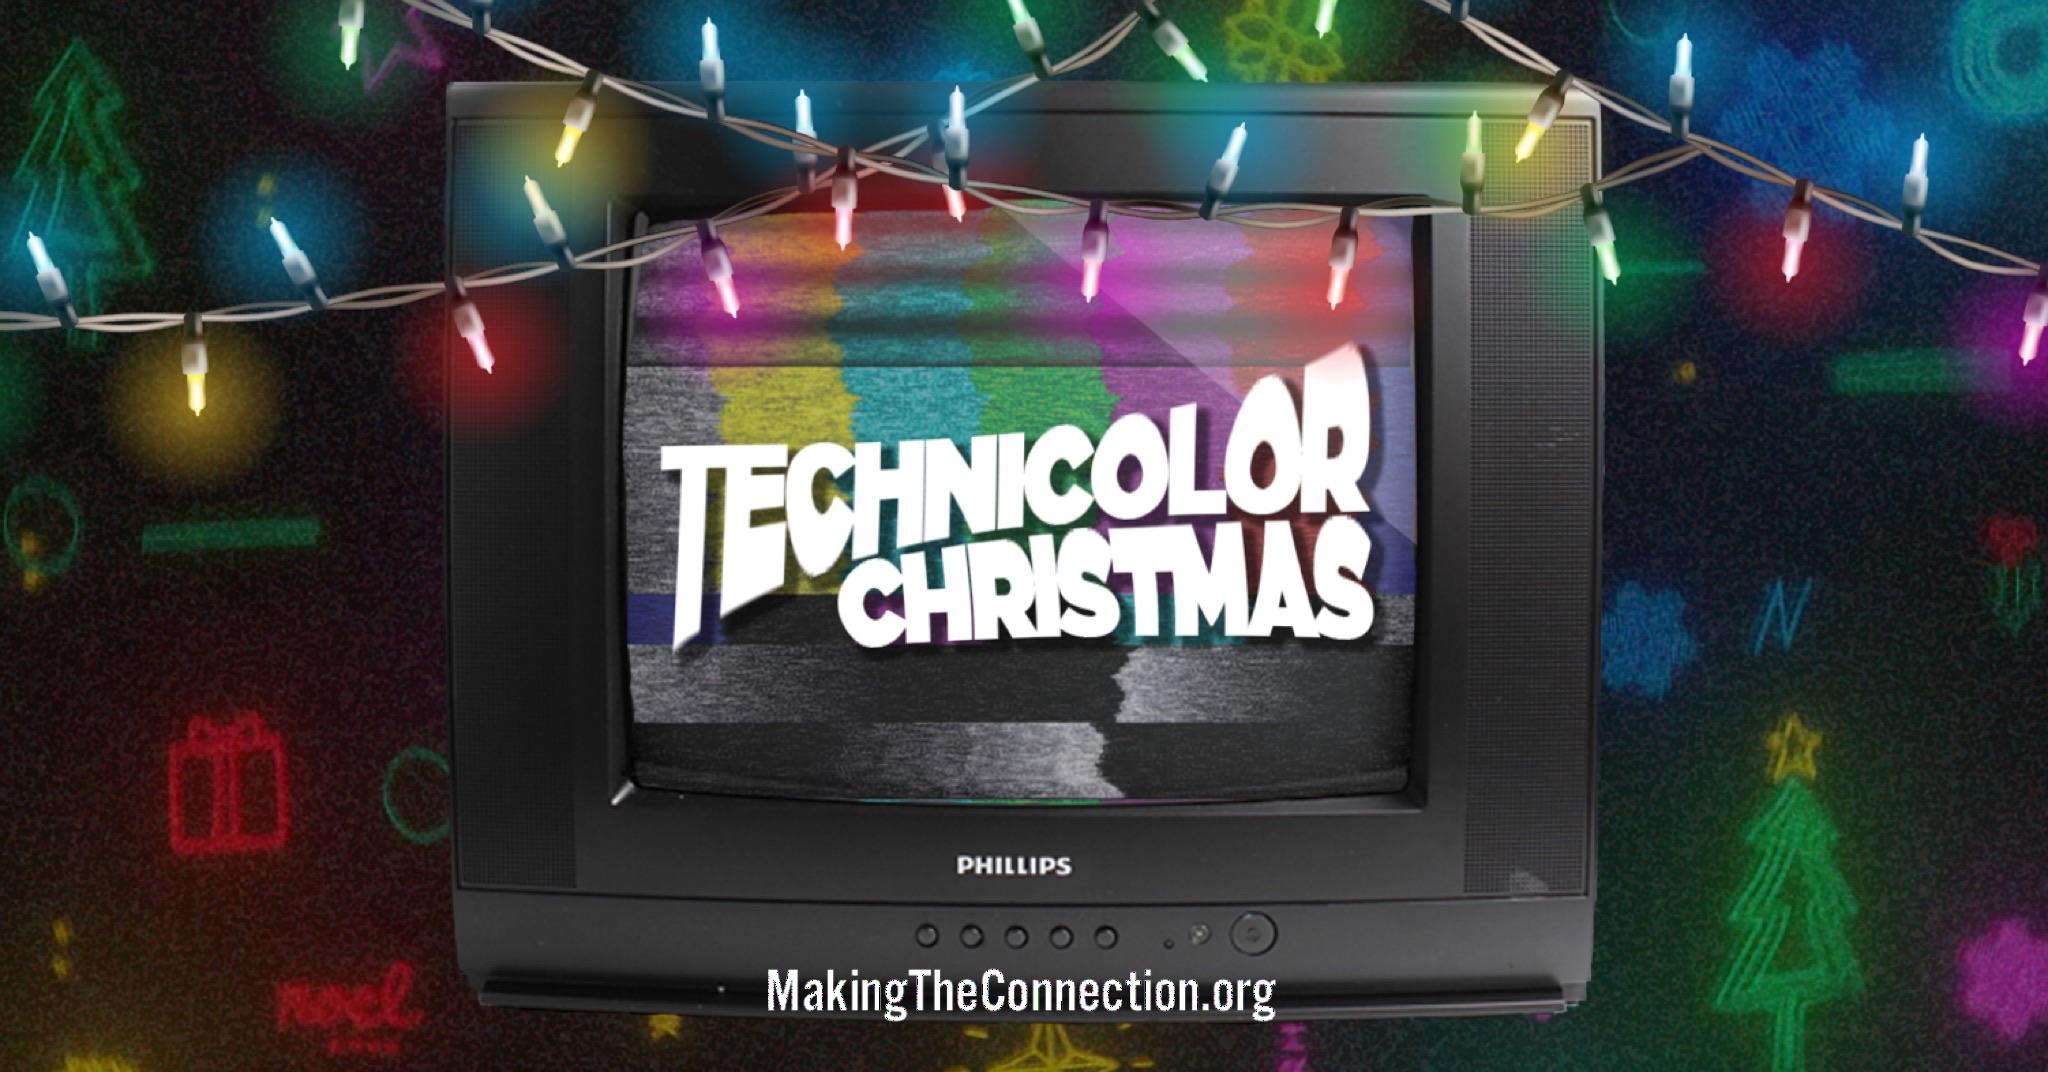 Technicolor Christmas